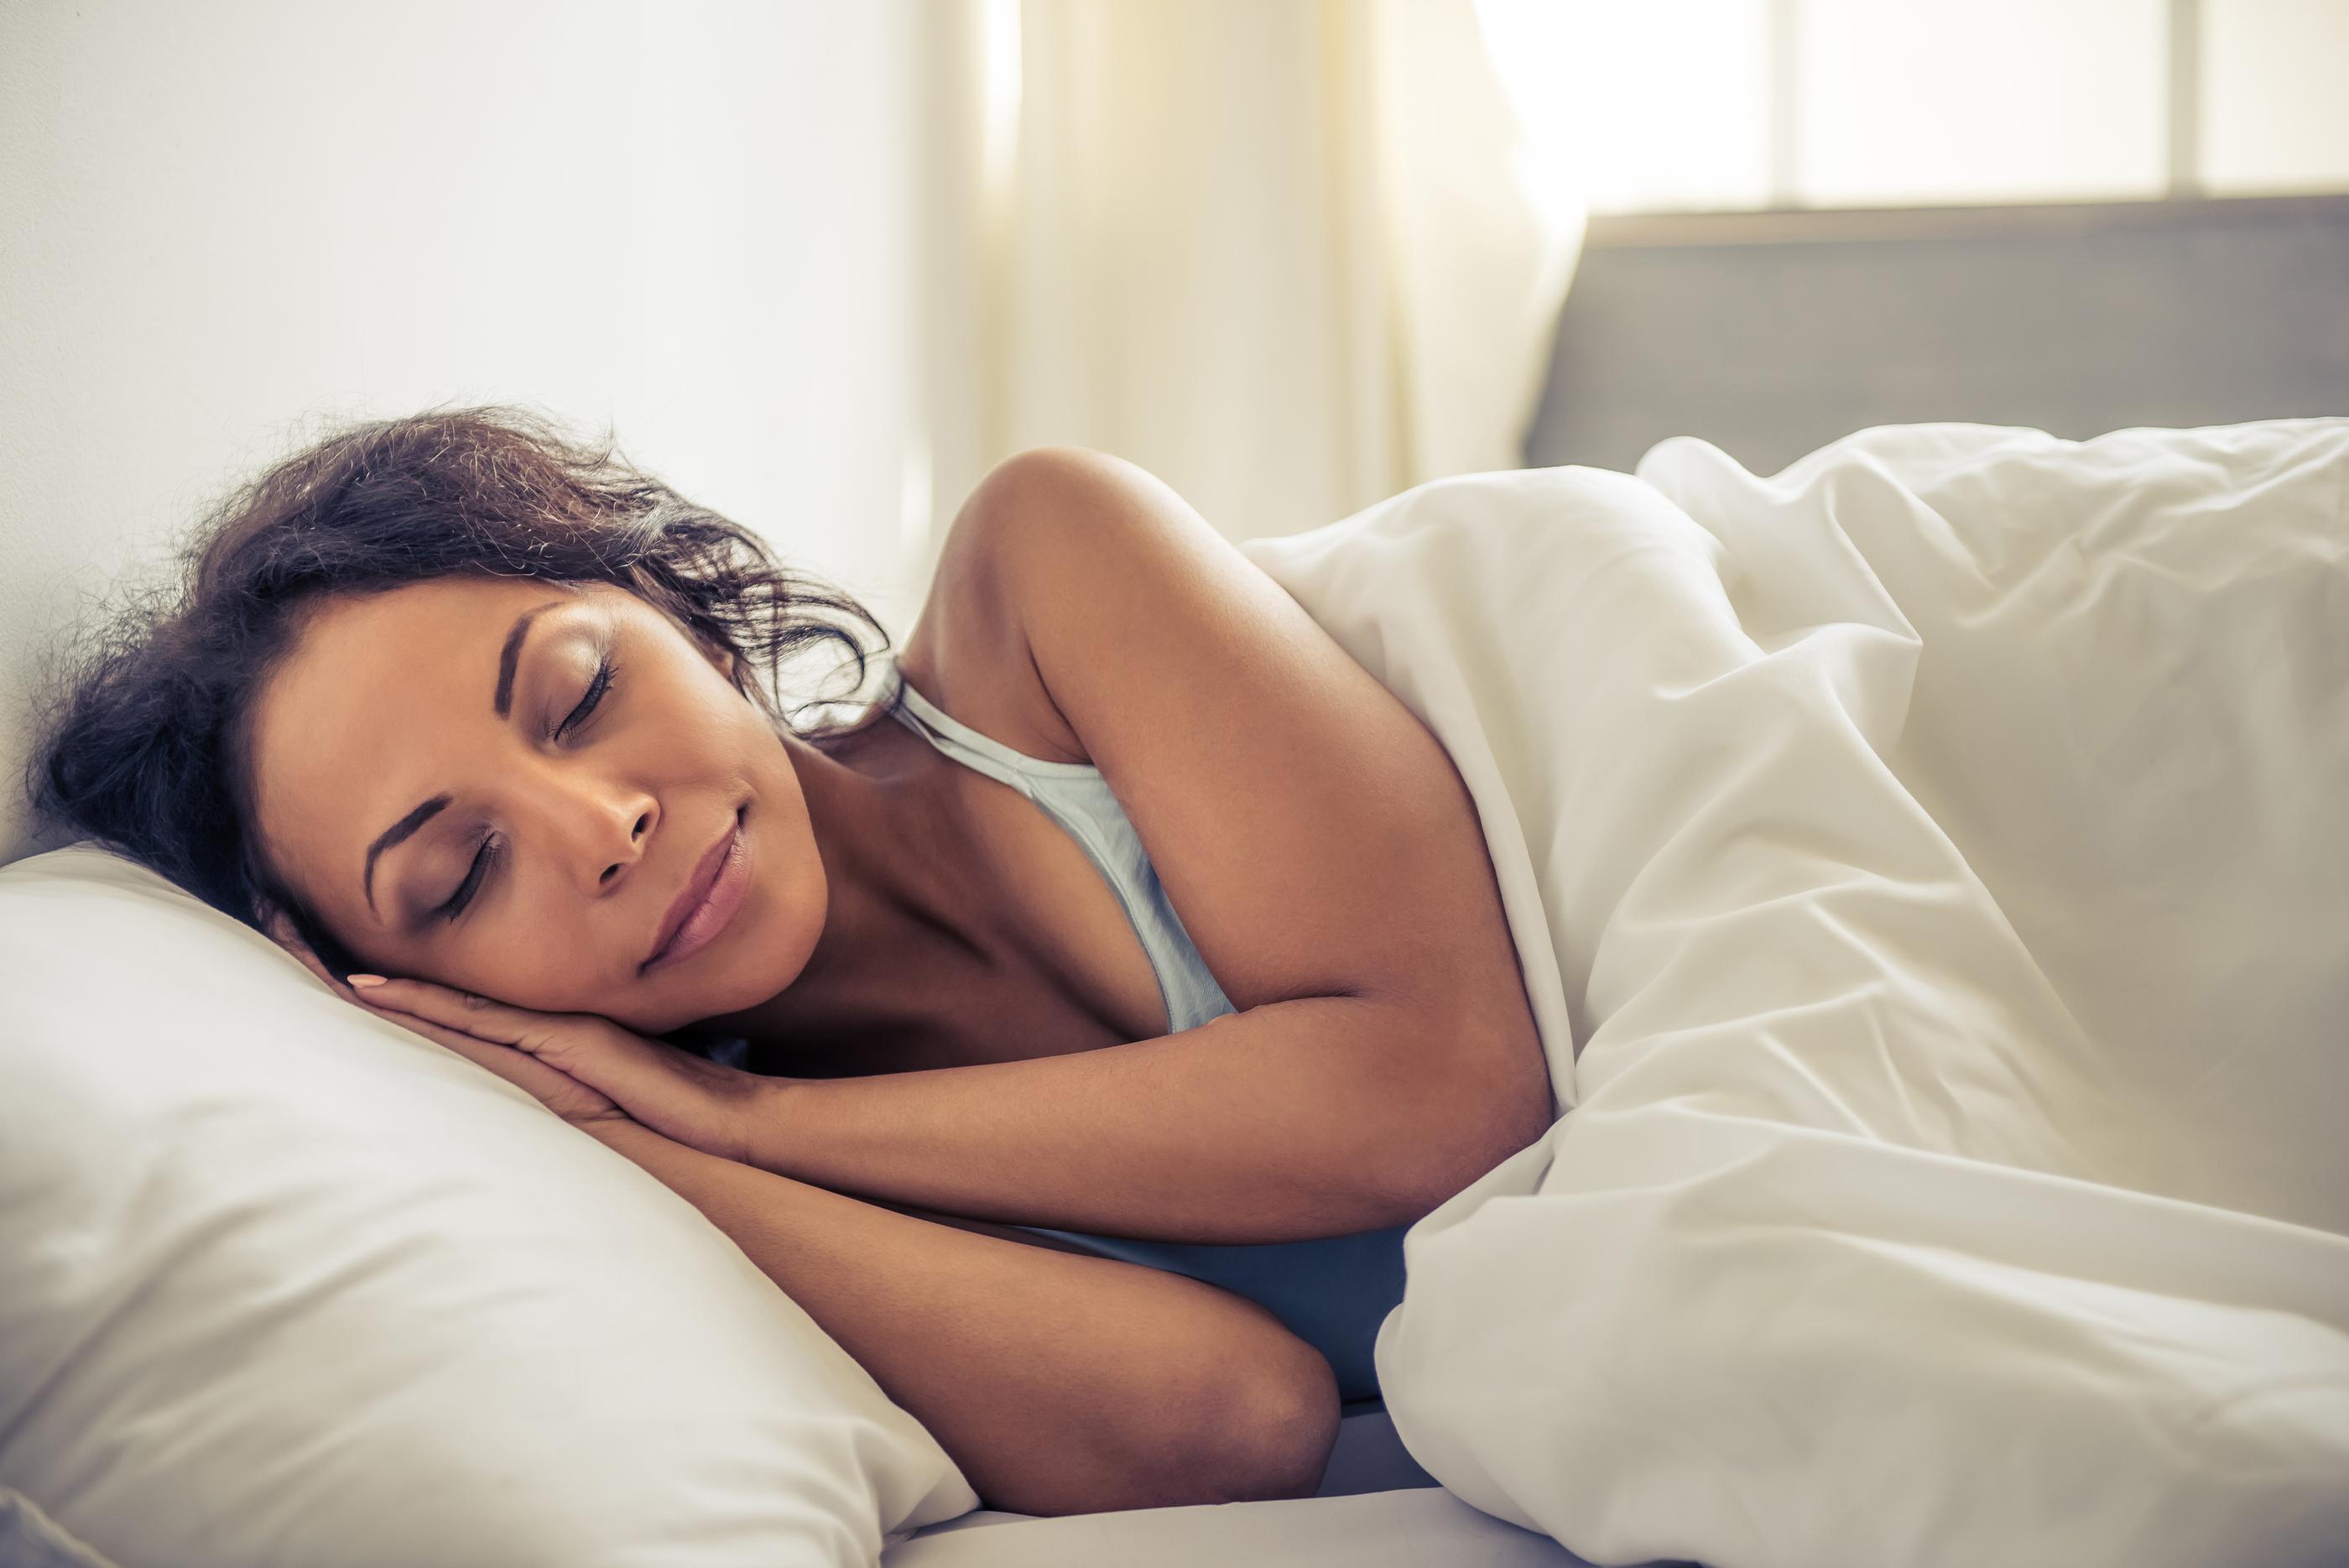 She said – I Went Right to Sleep